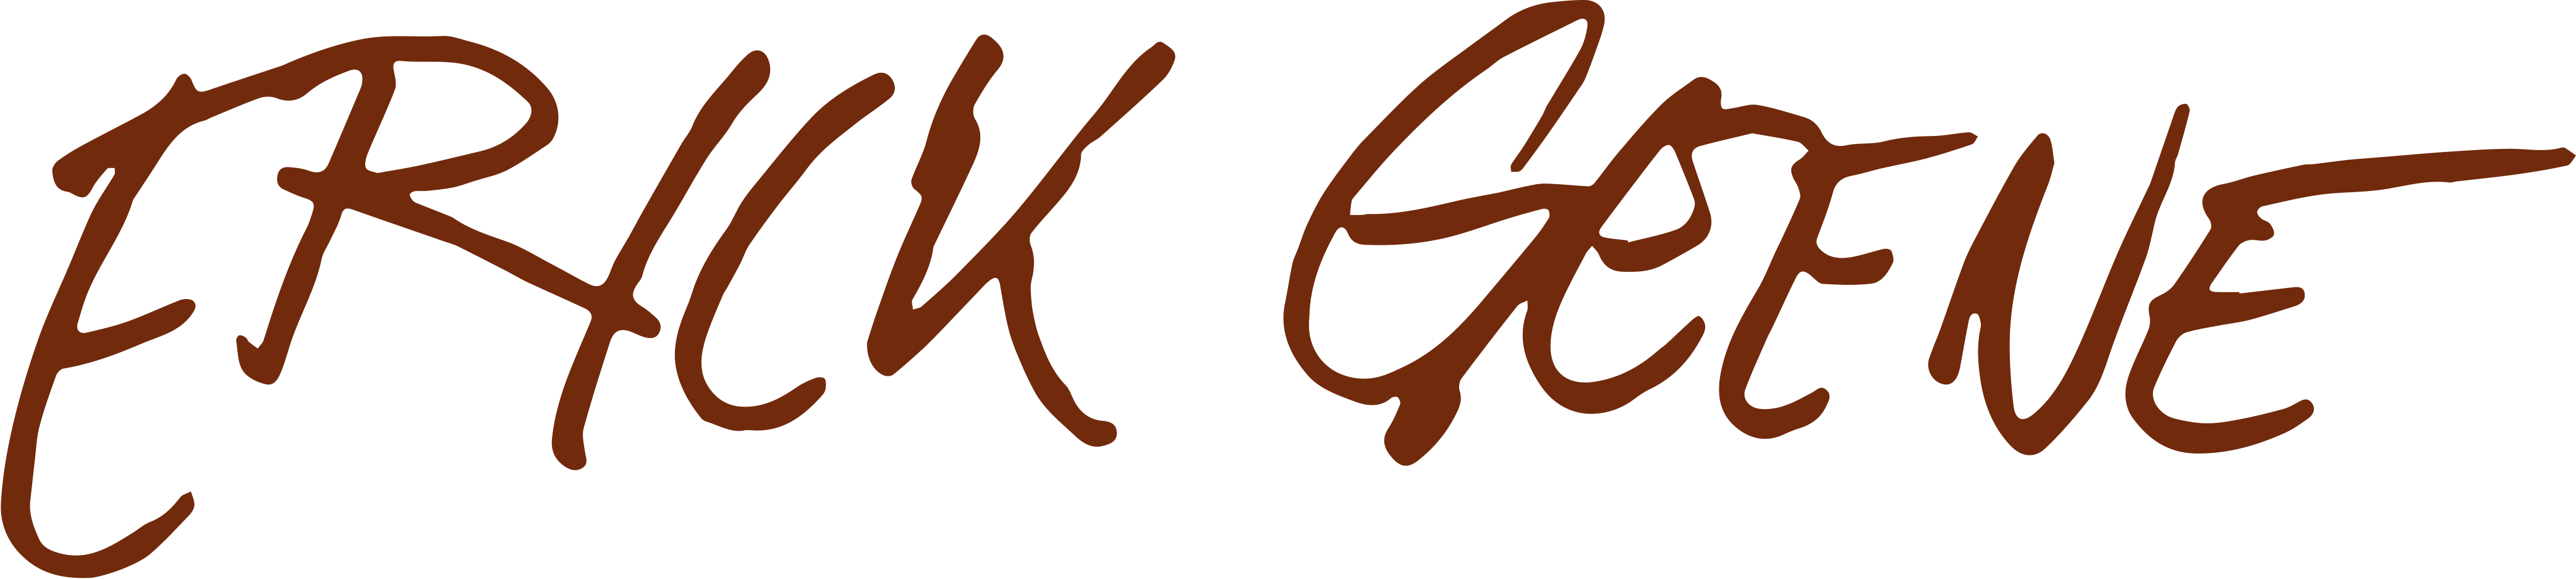 erickgeene_logo